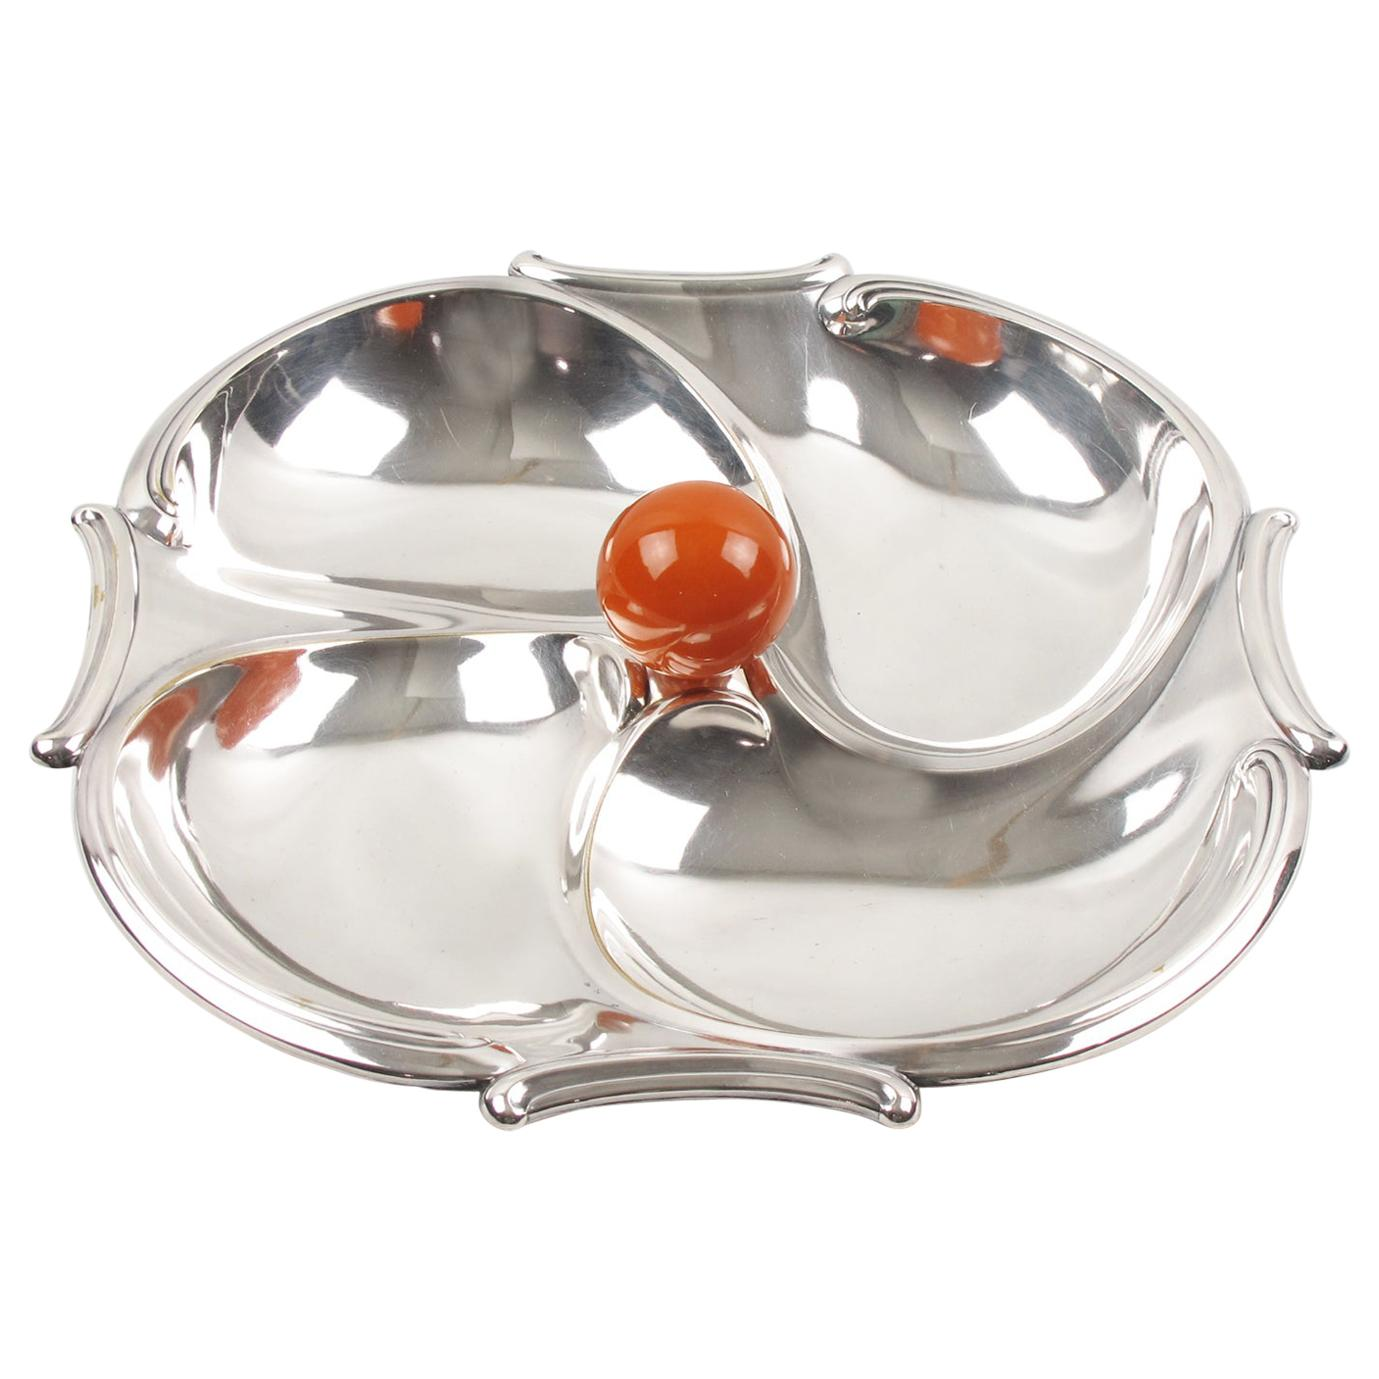 Art Deco 1930s Cocktail Silver Plate Bakelite Barware Tray Set